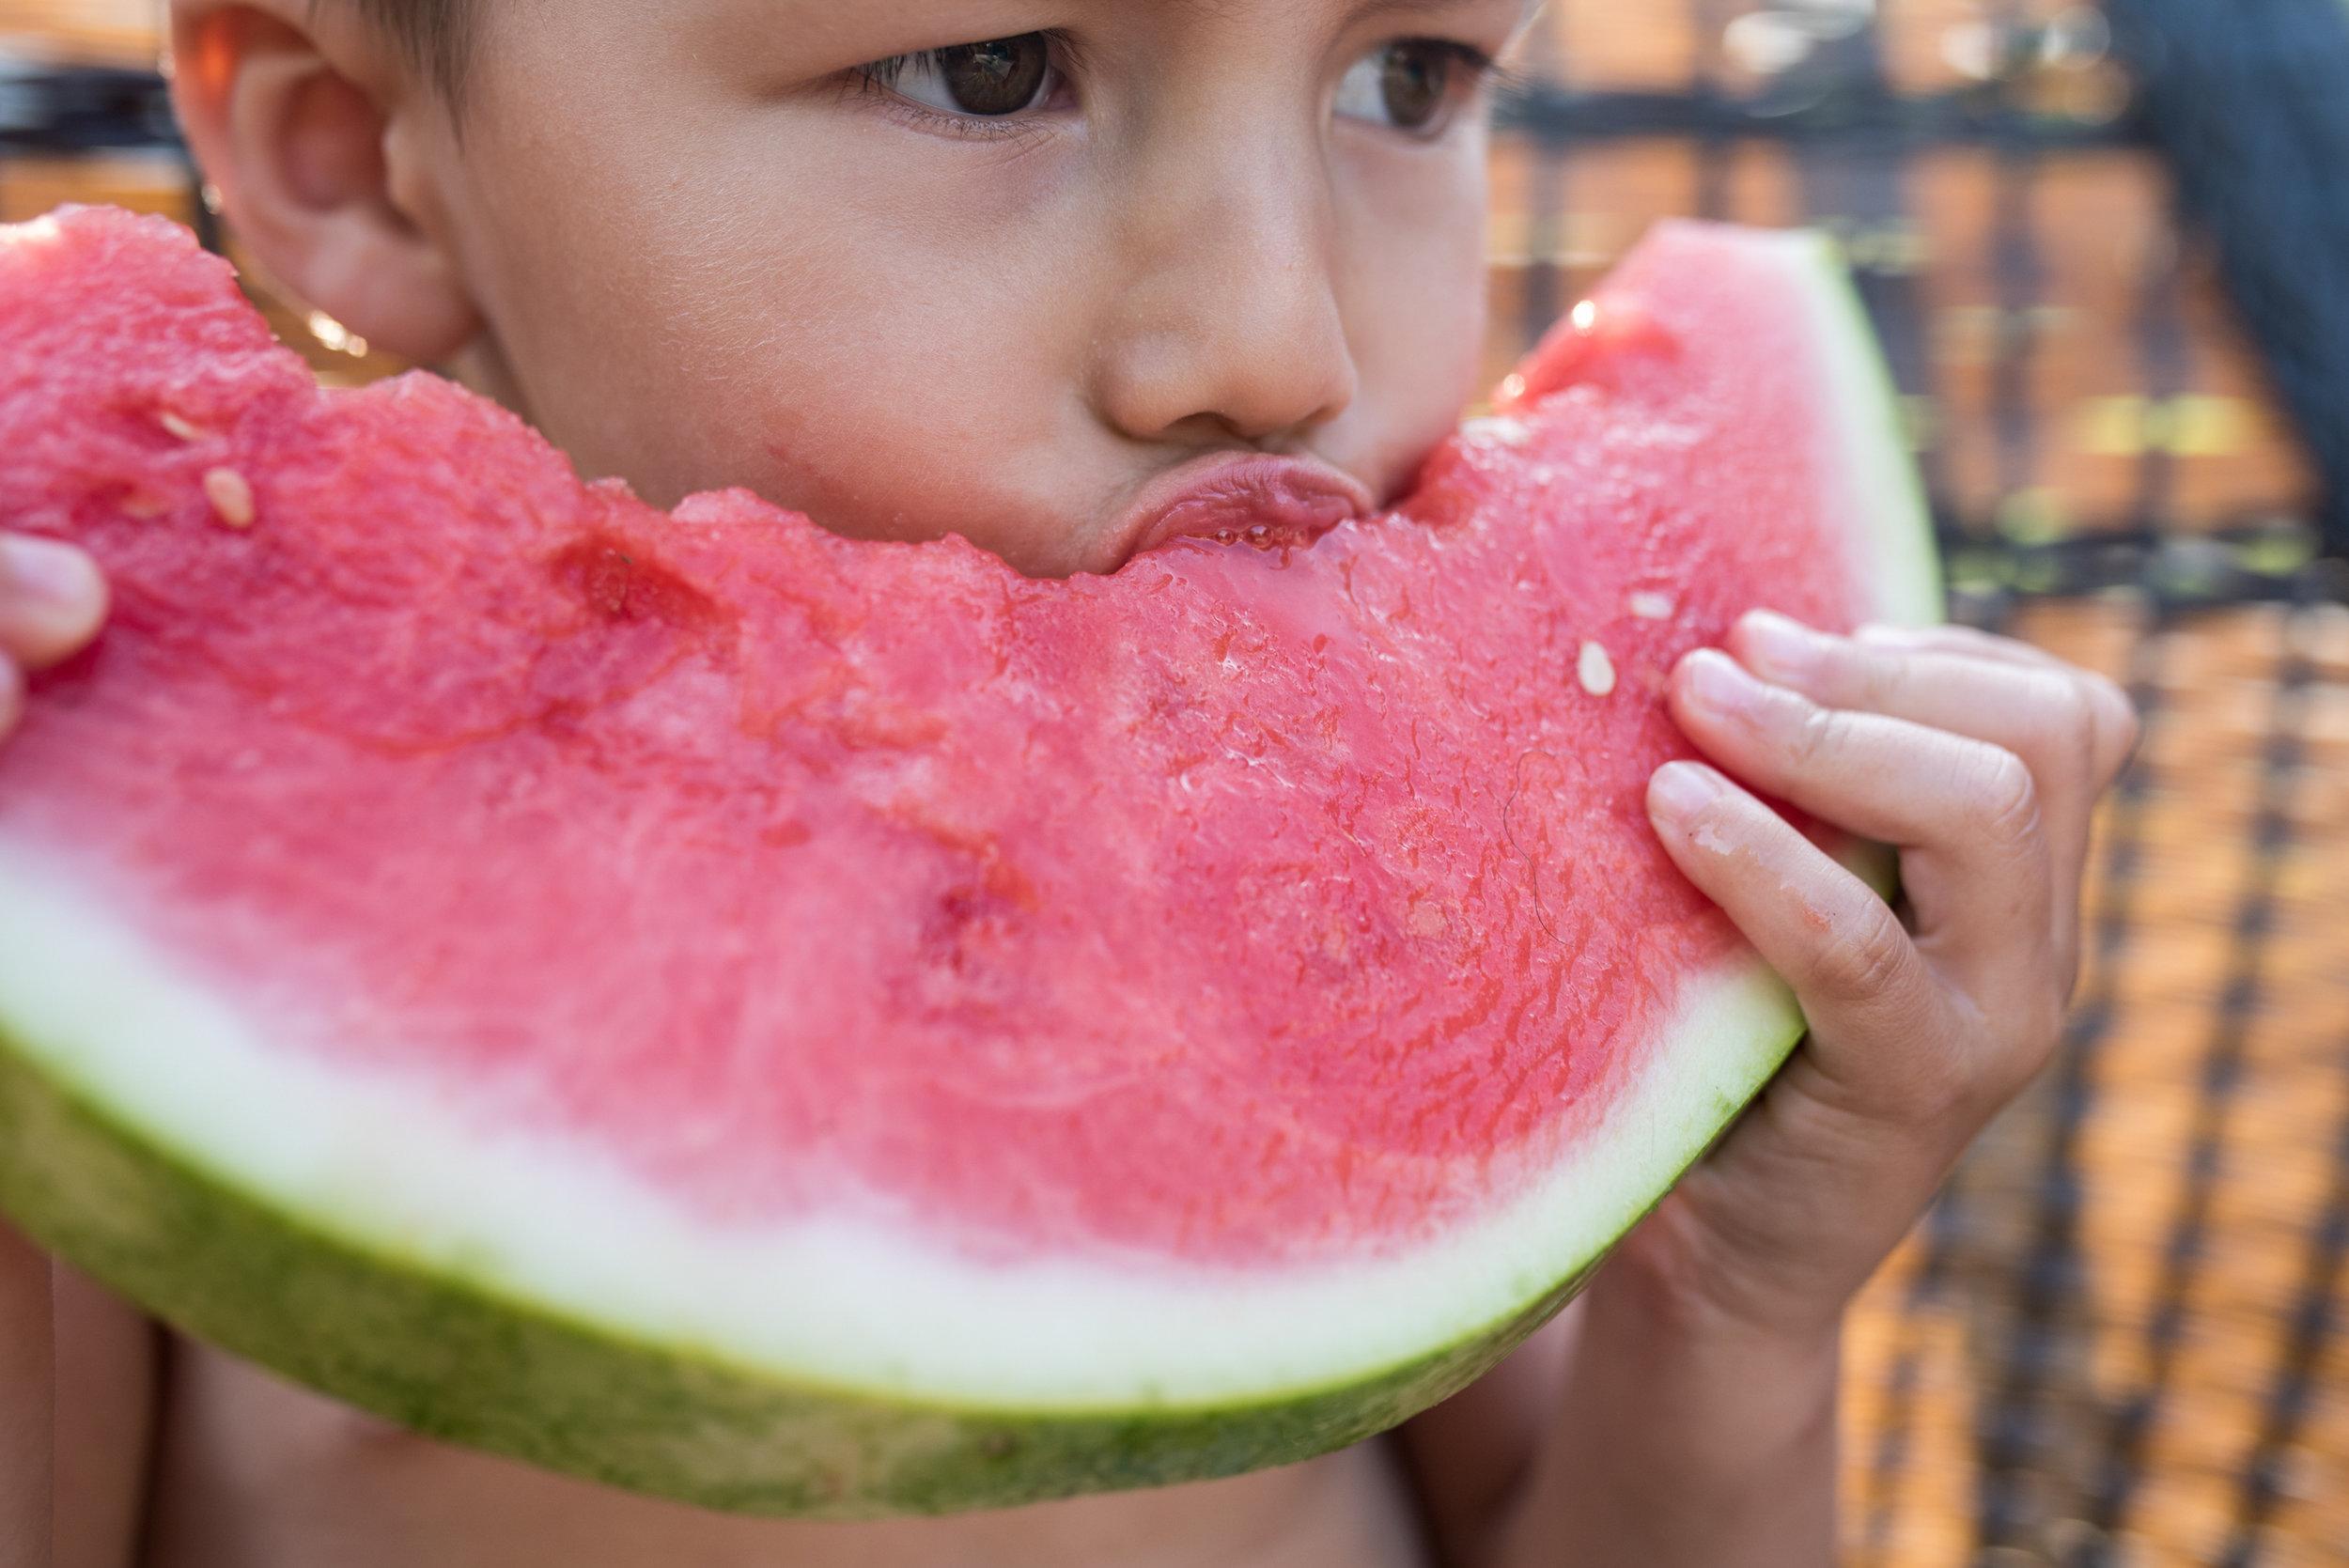 Kari Gierach Photography, Milwaukee Wisconsin documentary family photographer, Mukwonago wisconsin toddler boy eating watermelon in summer-1.jpg